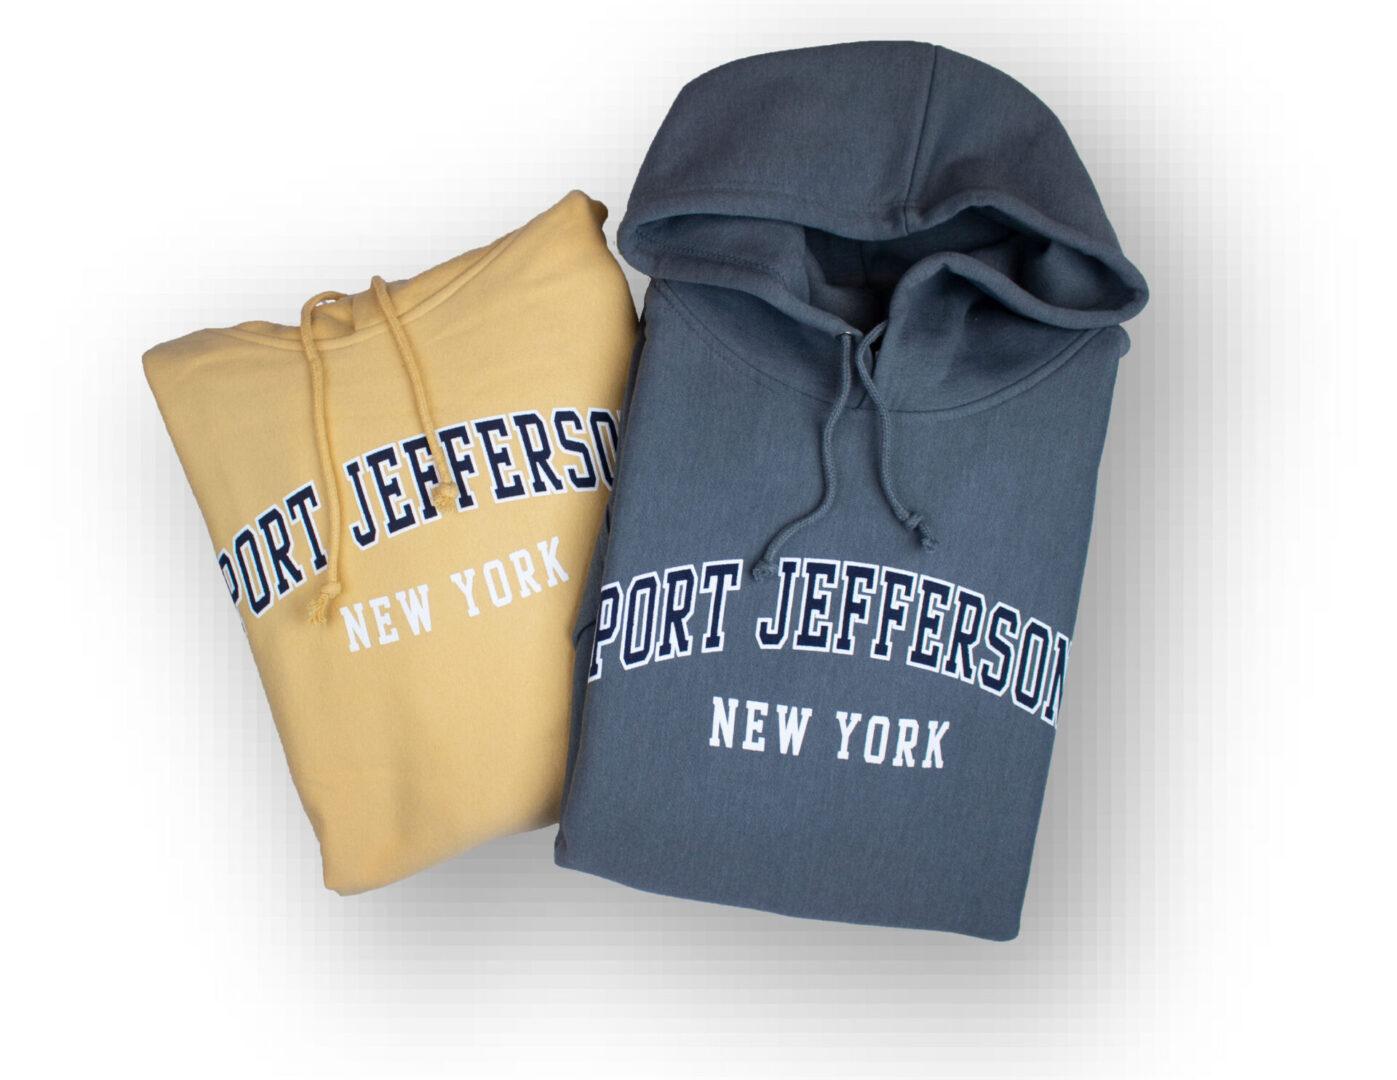 port jefferson heavyweight hoodies in steel grey and yellow